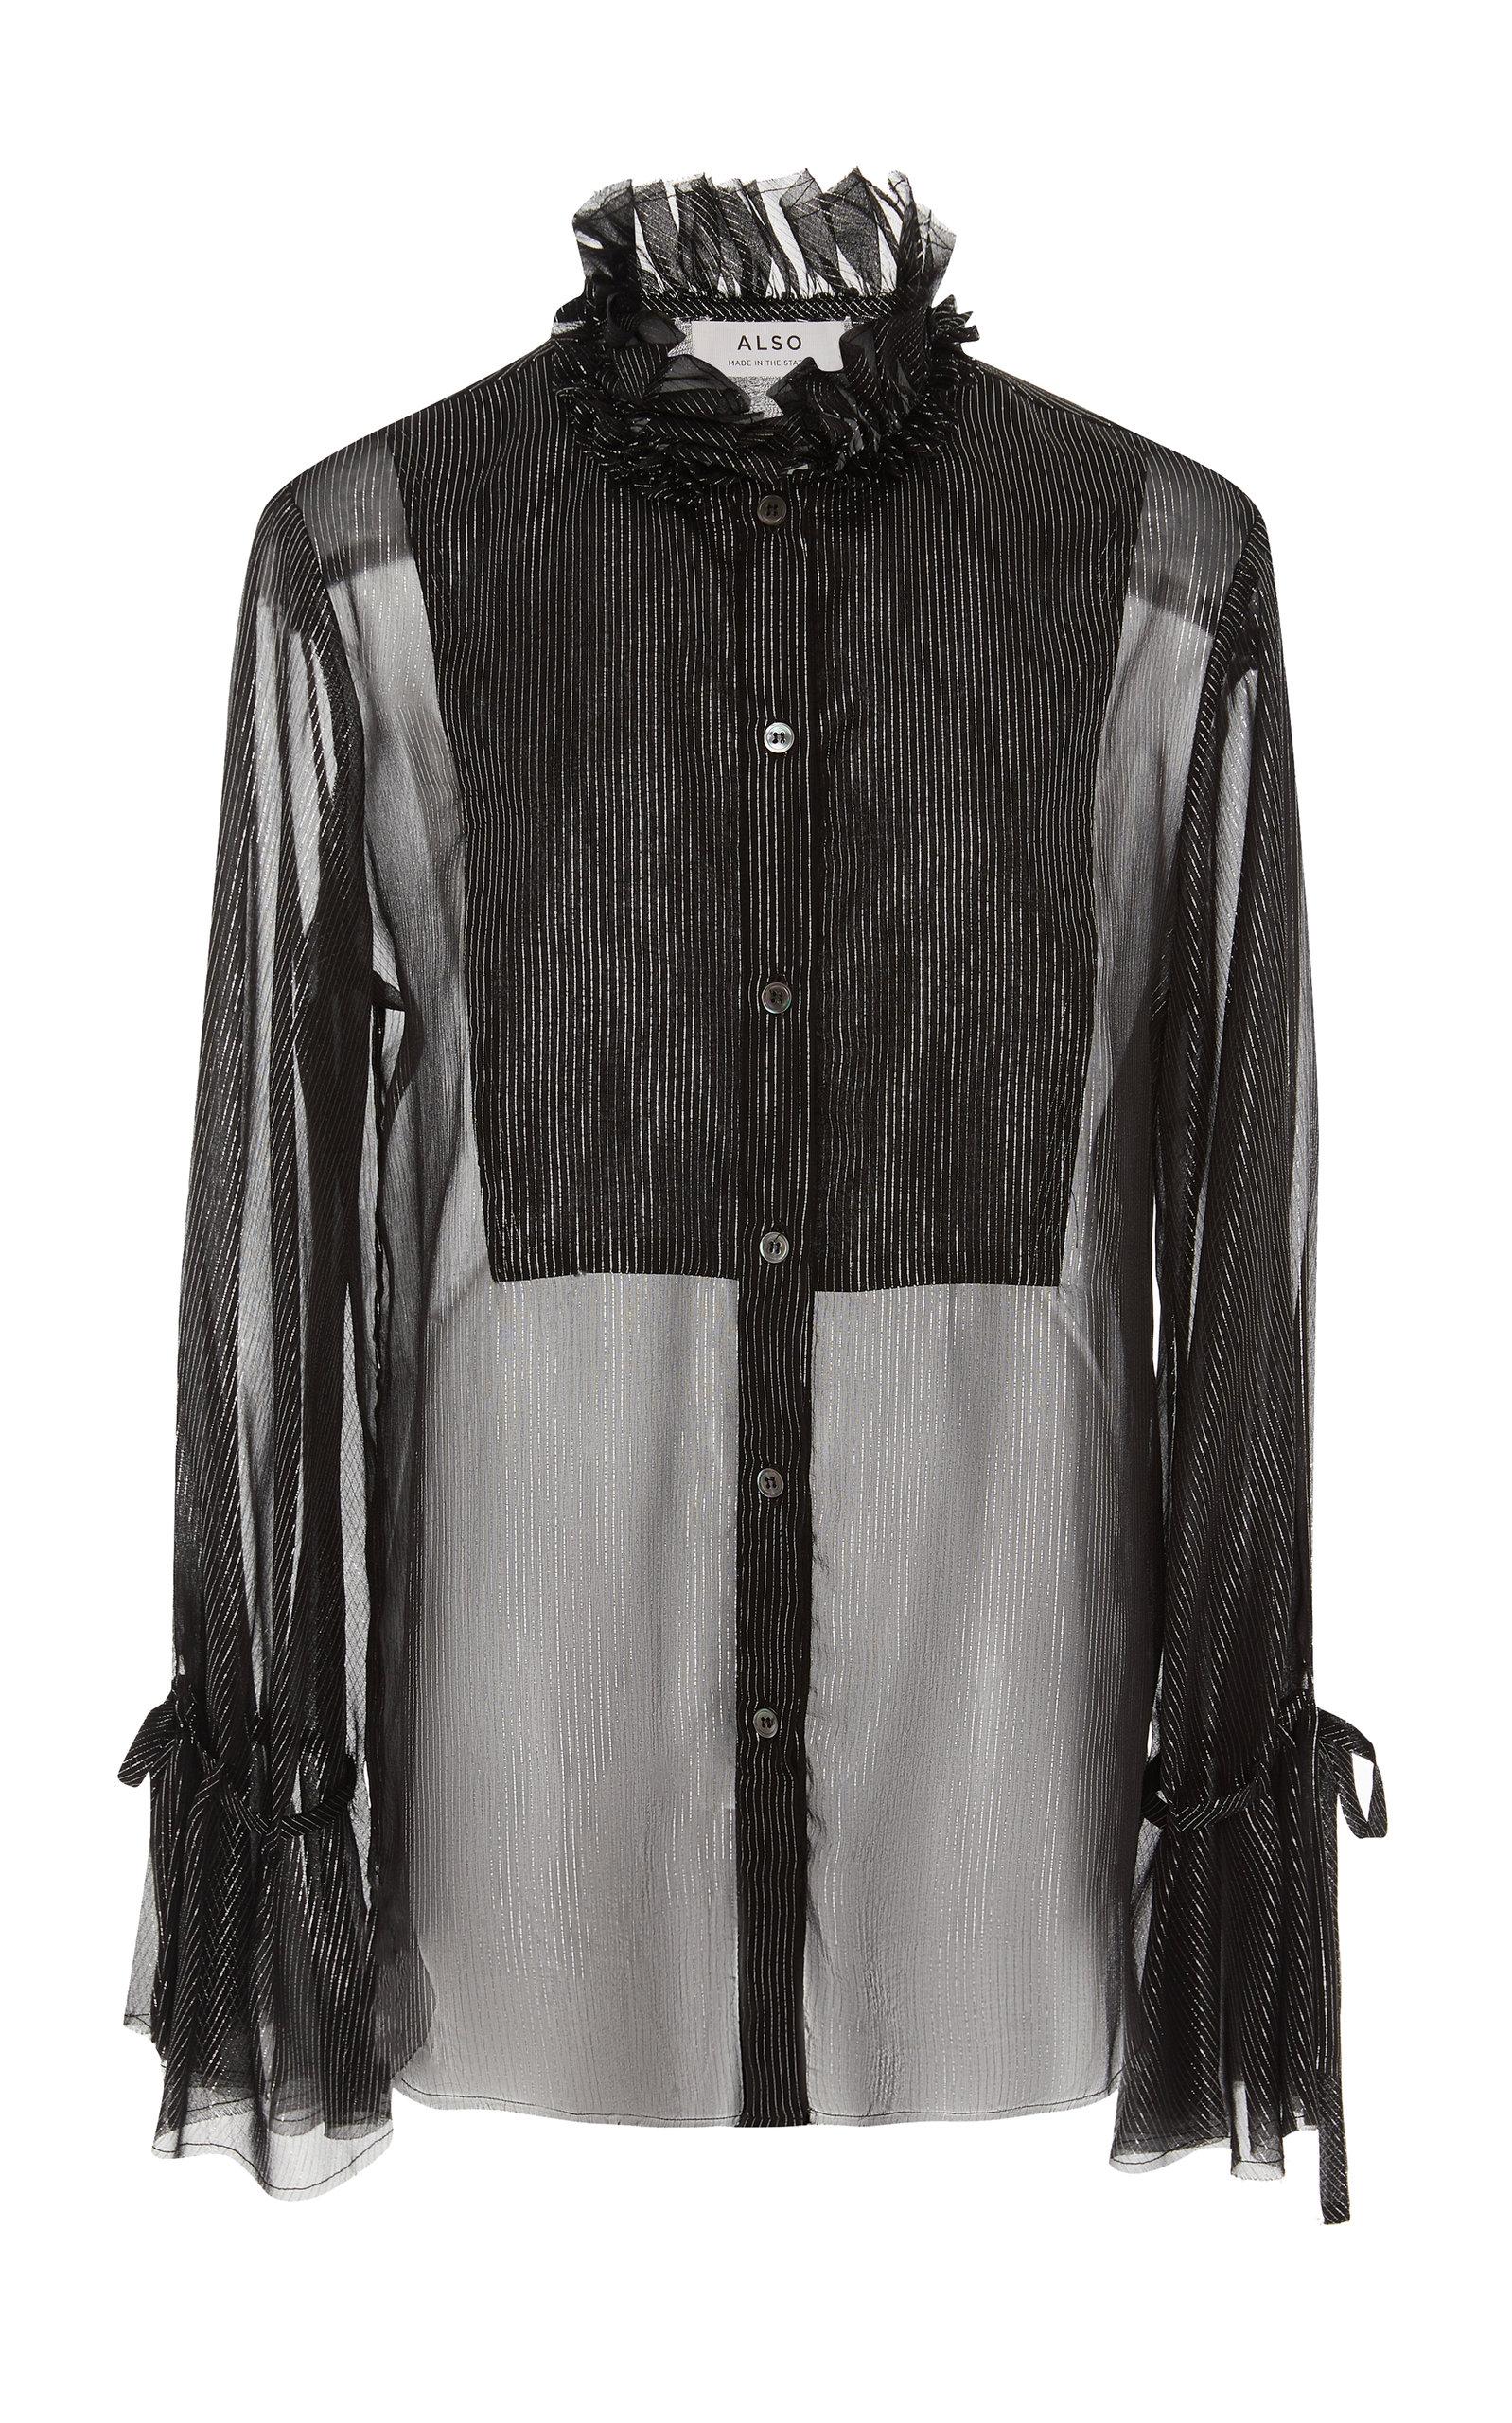 ALSO Gwenyth Sheer Metallic Blouse in Black